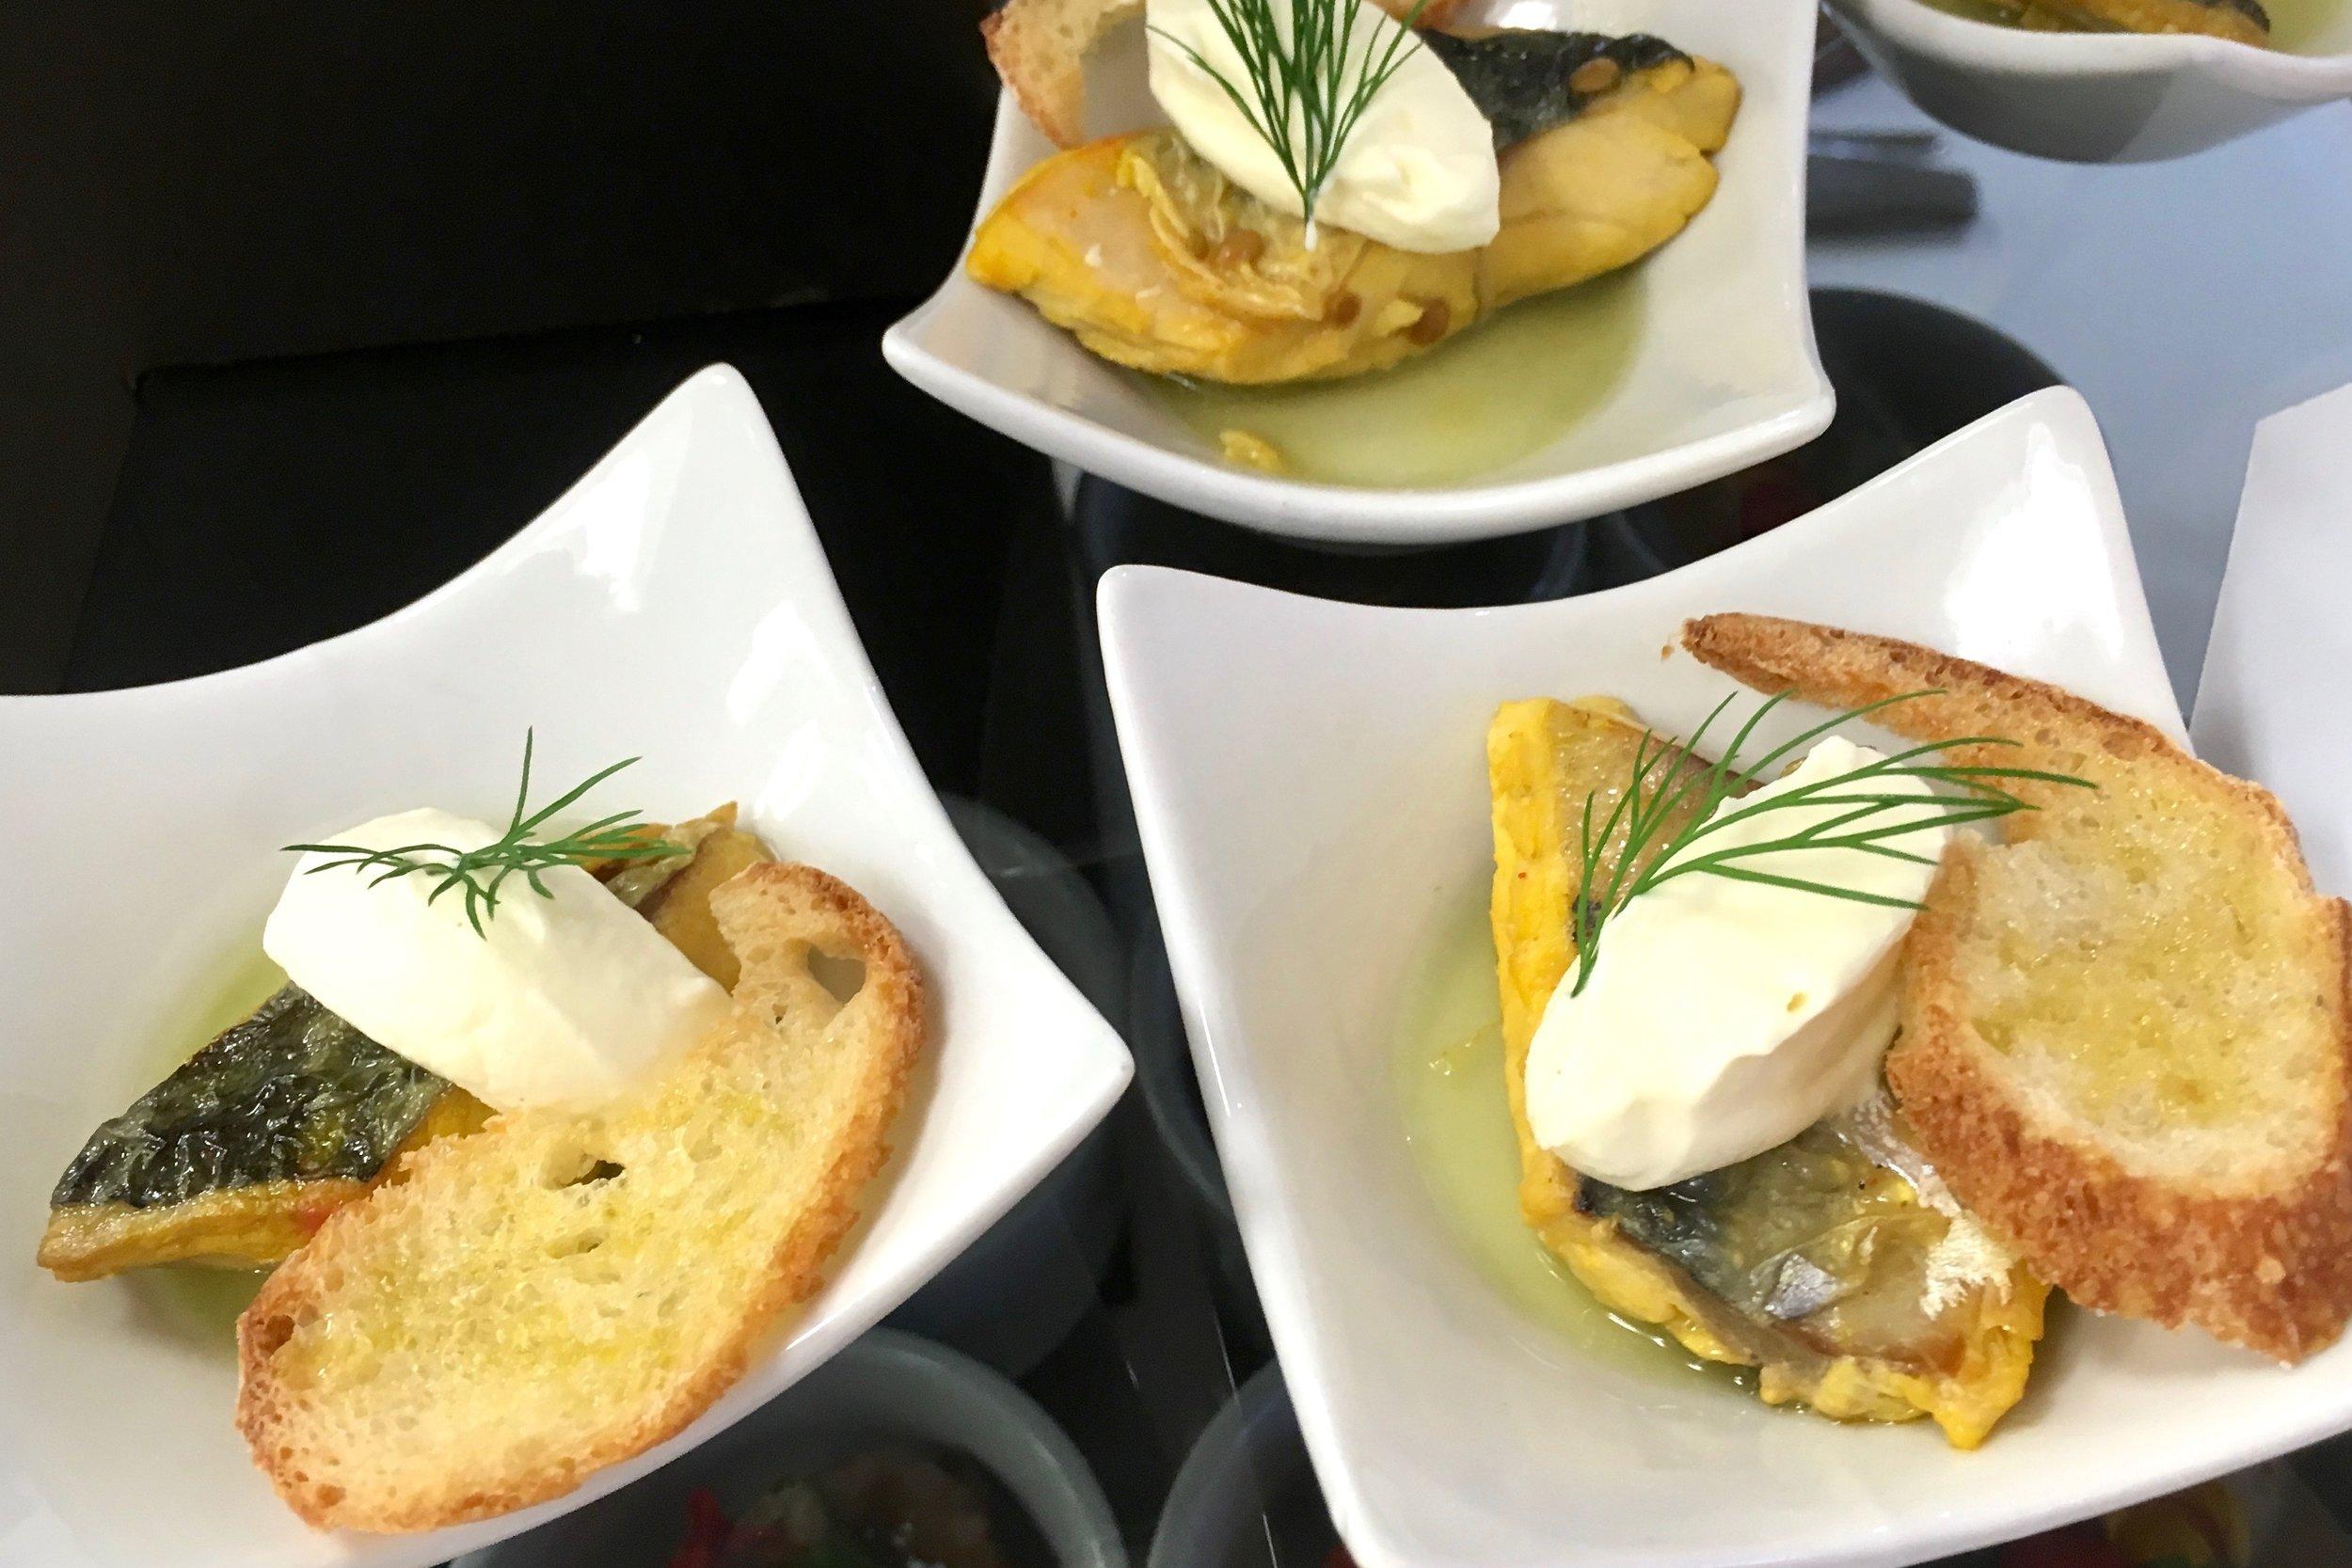 Mackerel escabeche style, cucumber jelly, horseradish Chantilly and melba toast